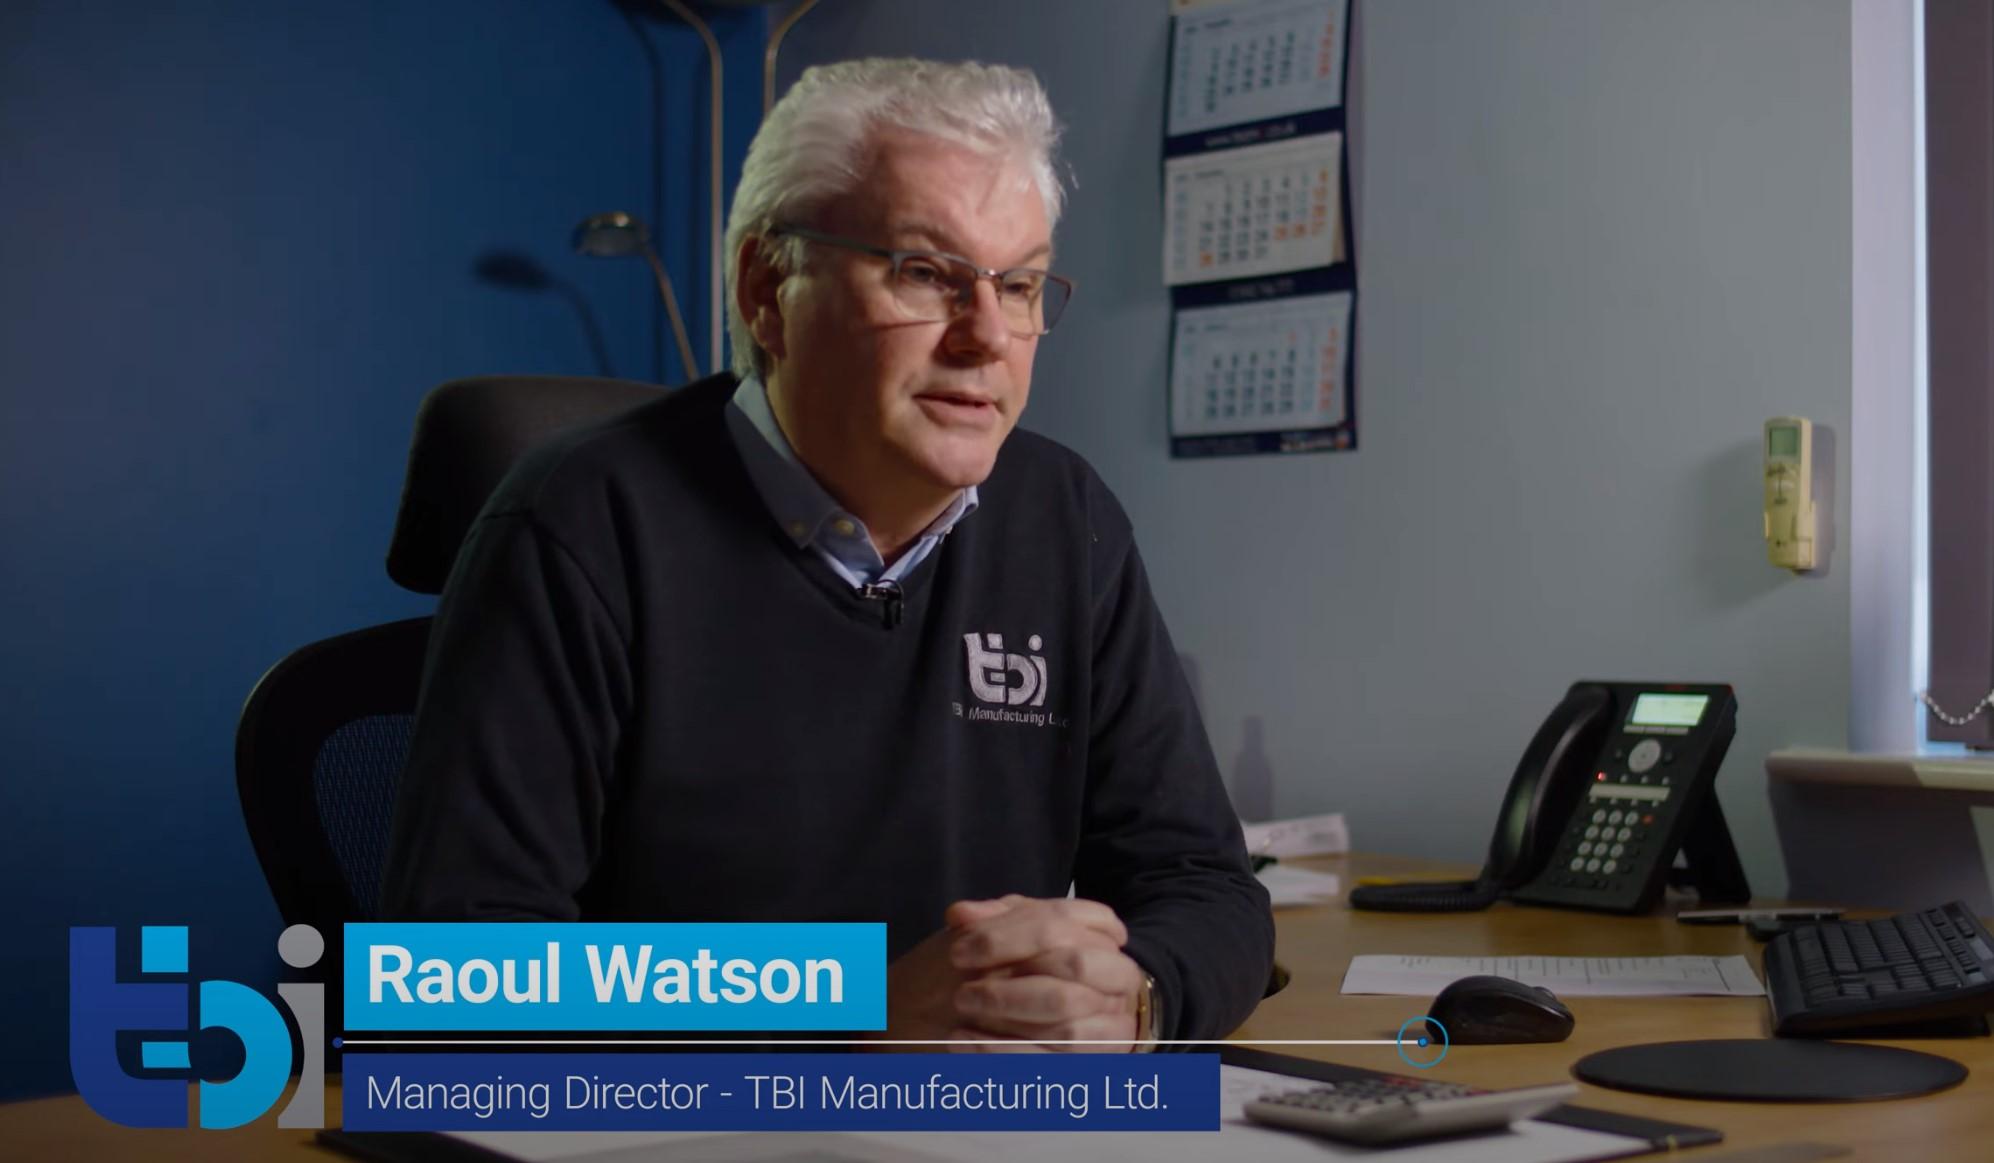 Curvadoras de tubo AMOB - Raoul Watson - Diretor Geral da TBI